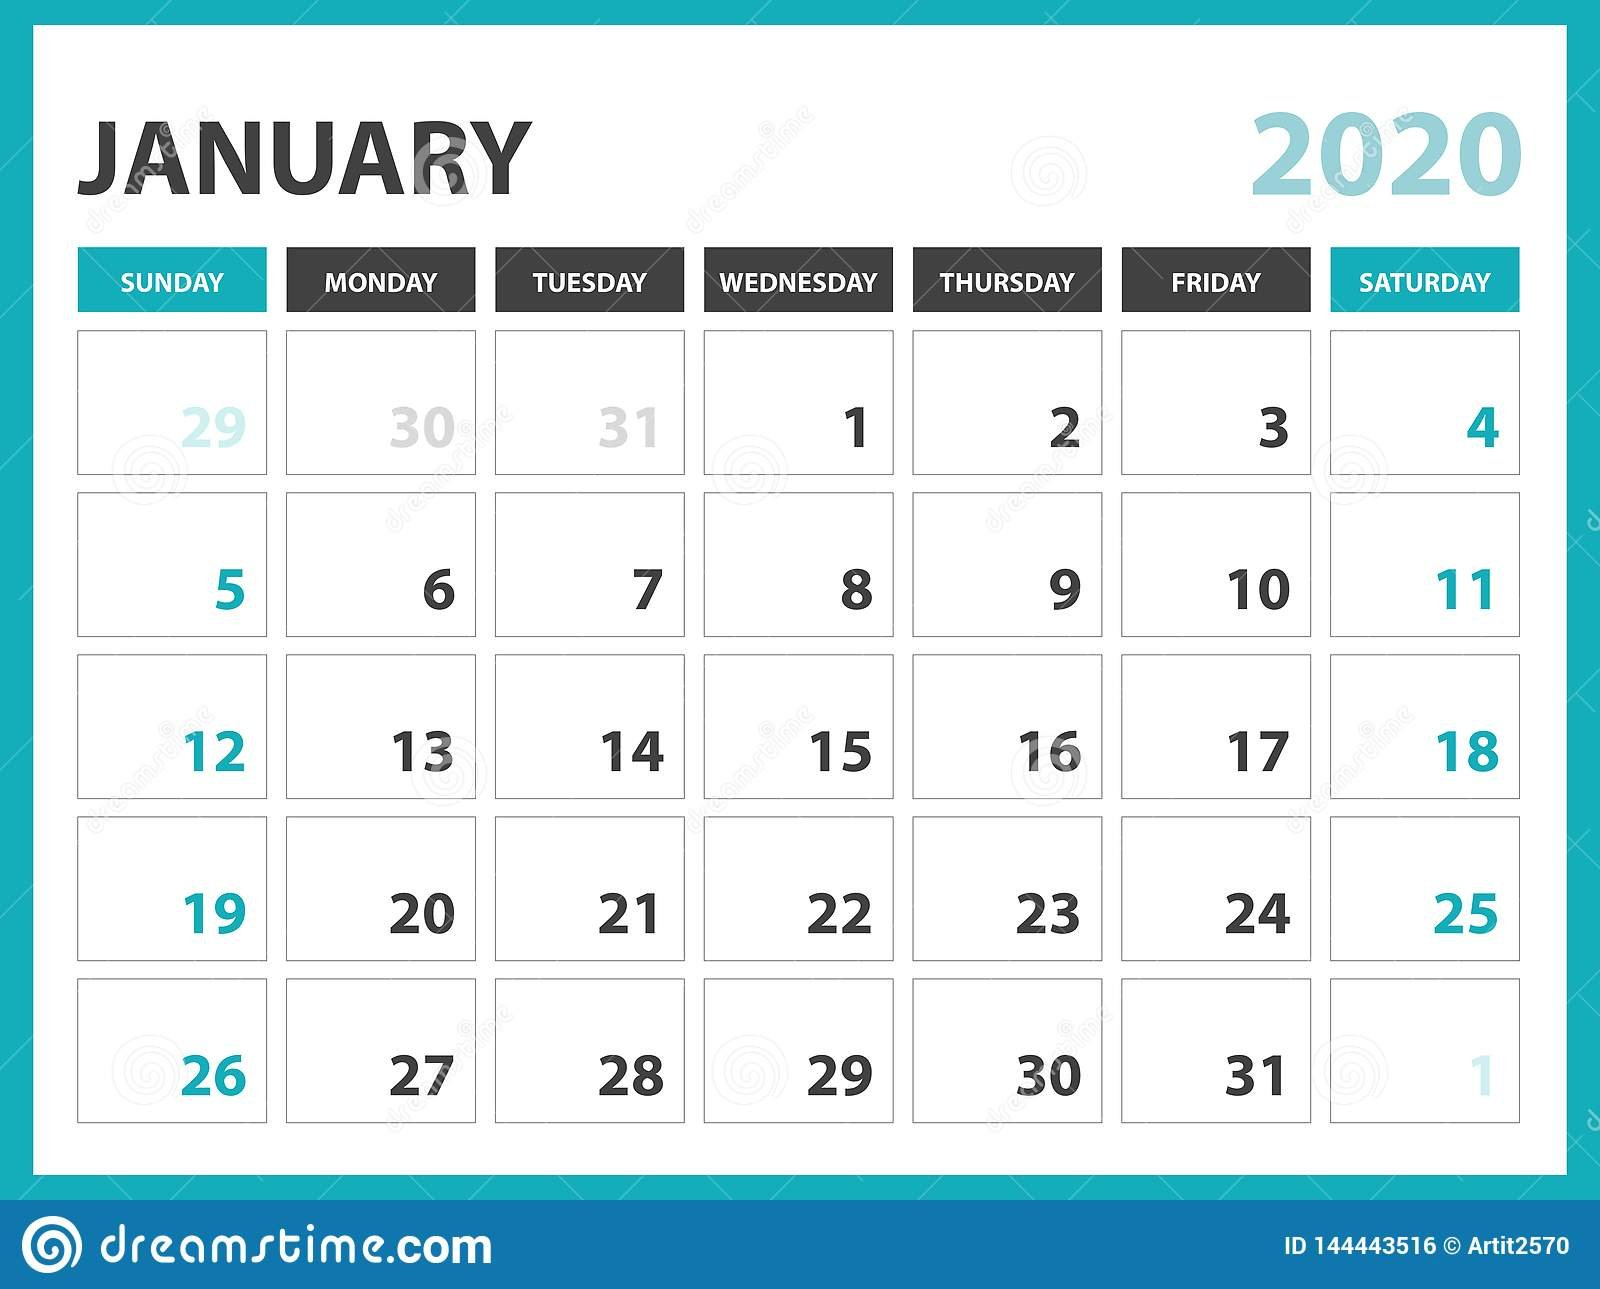 Desk Calendar Layout Size 8 X 6 Inch, January 2020 Calendar Free Printable Calendars 8 Week